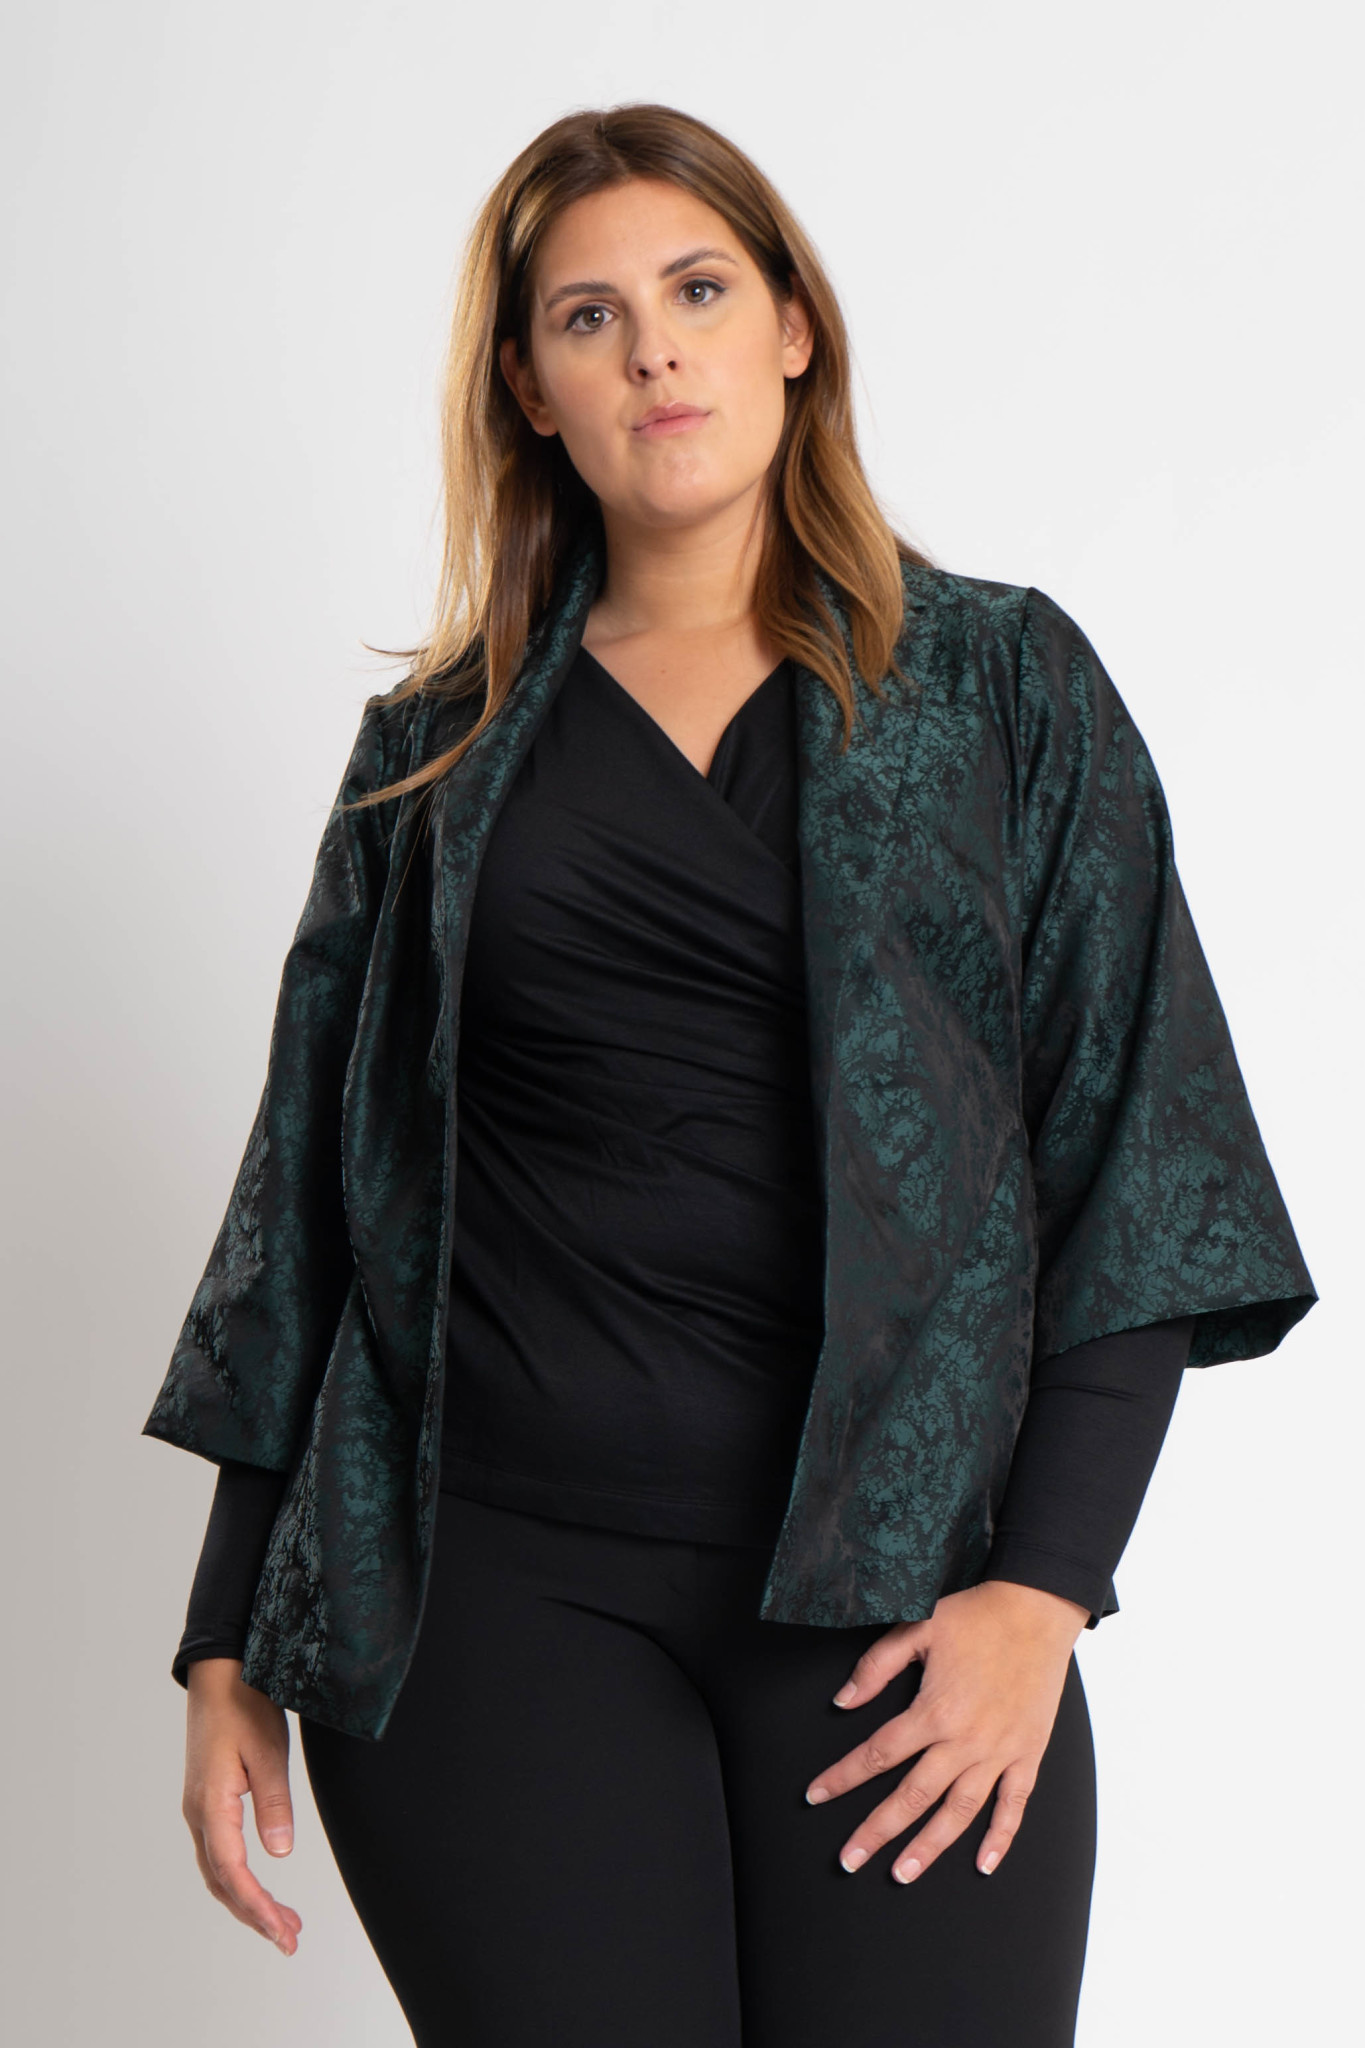 HISA Jacke aus Polyester Jacquard-1